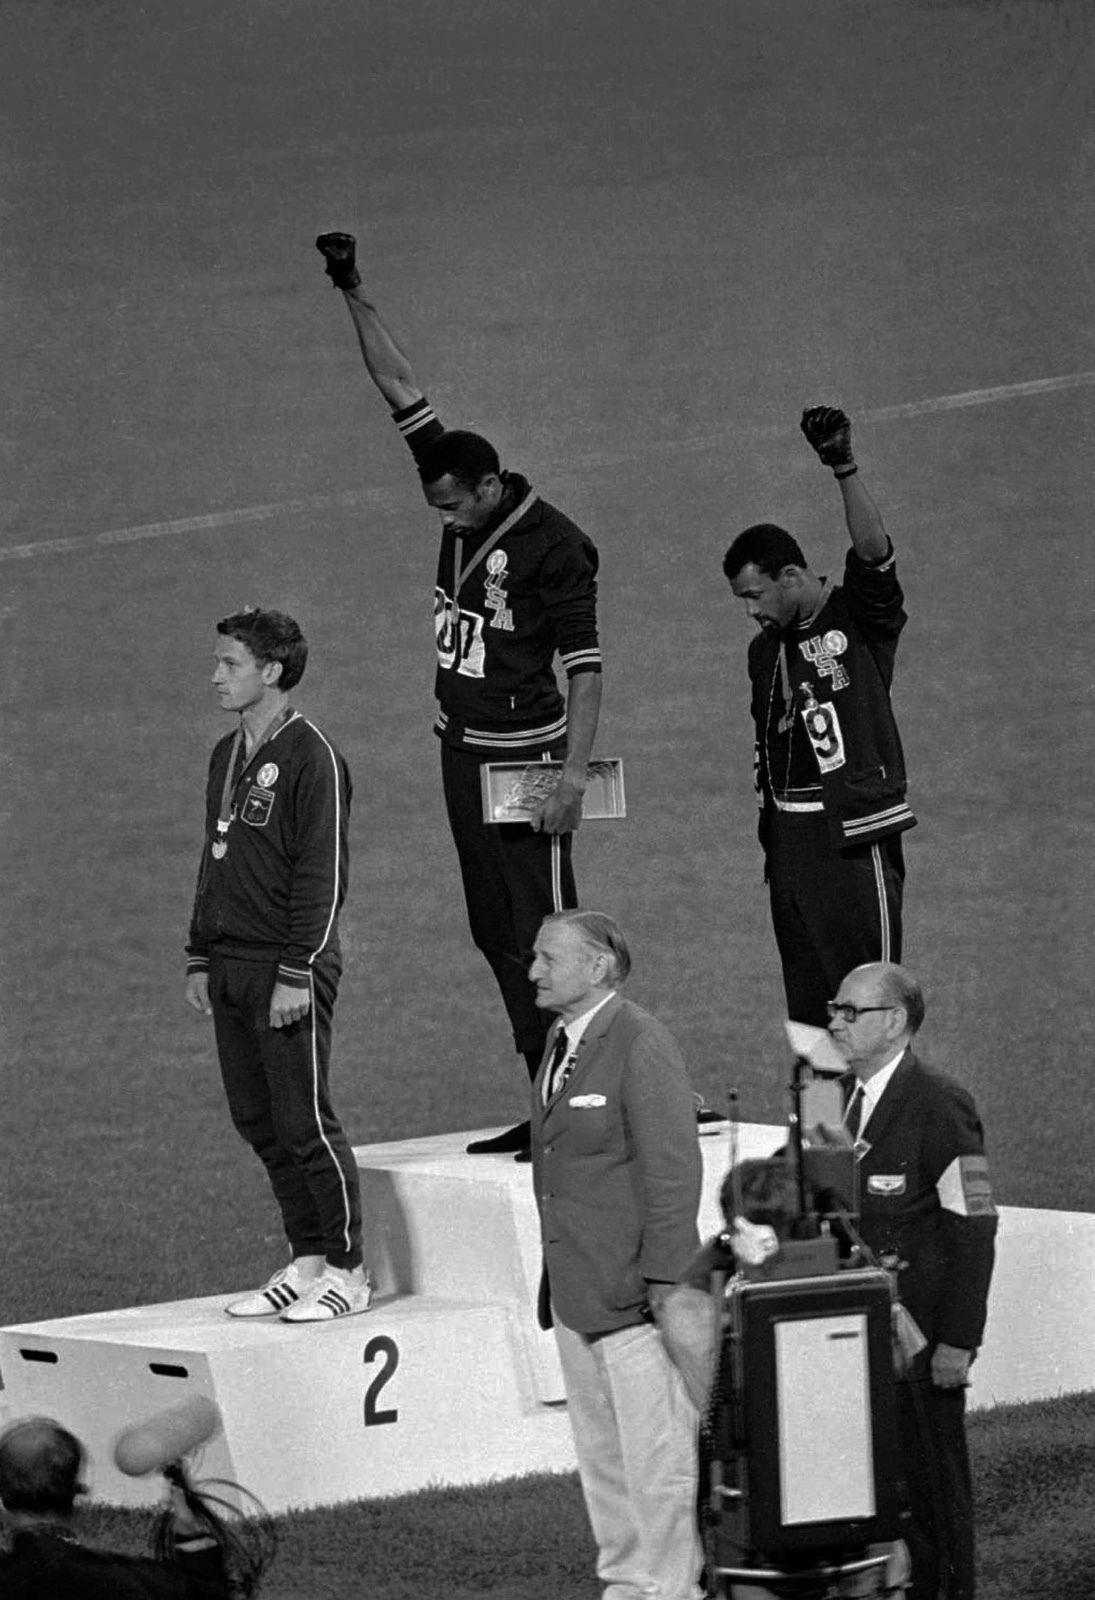 Black Power Salute 1968 Olympics Poster Black power